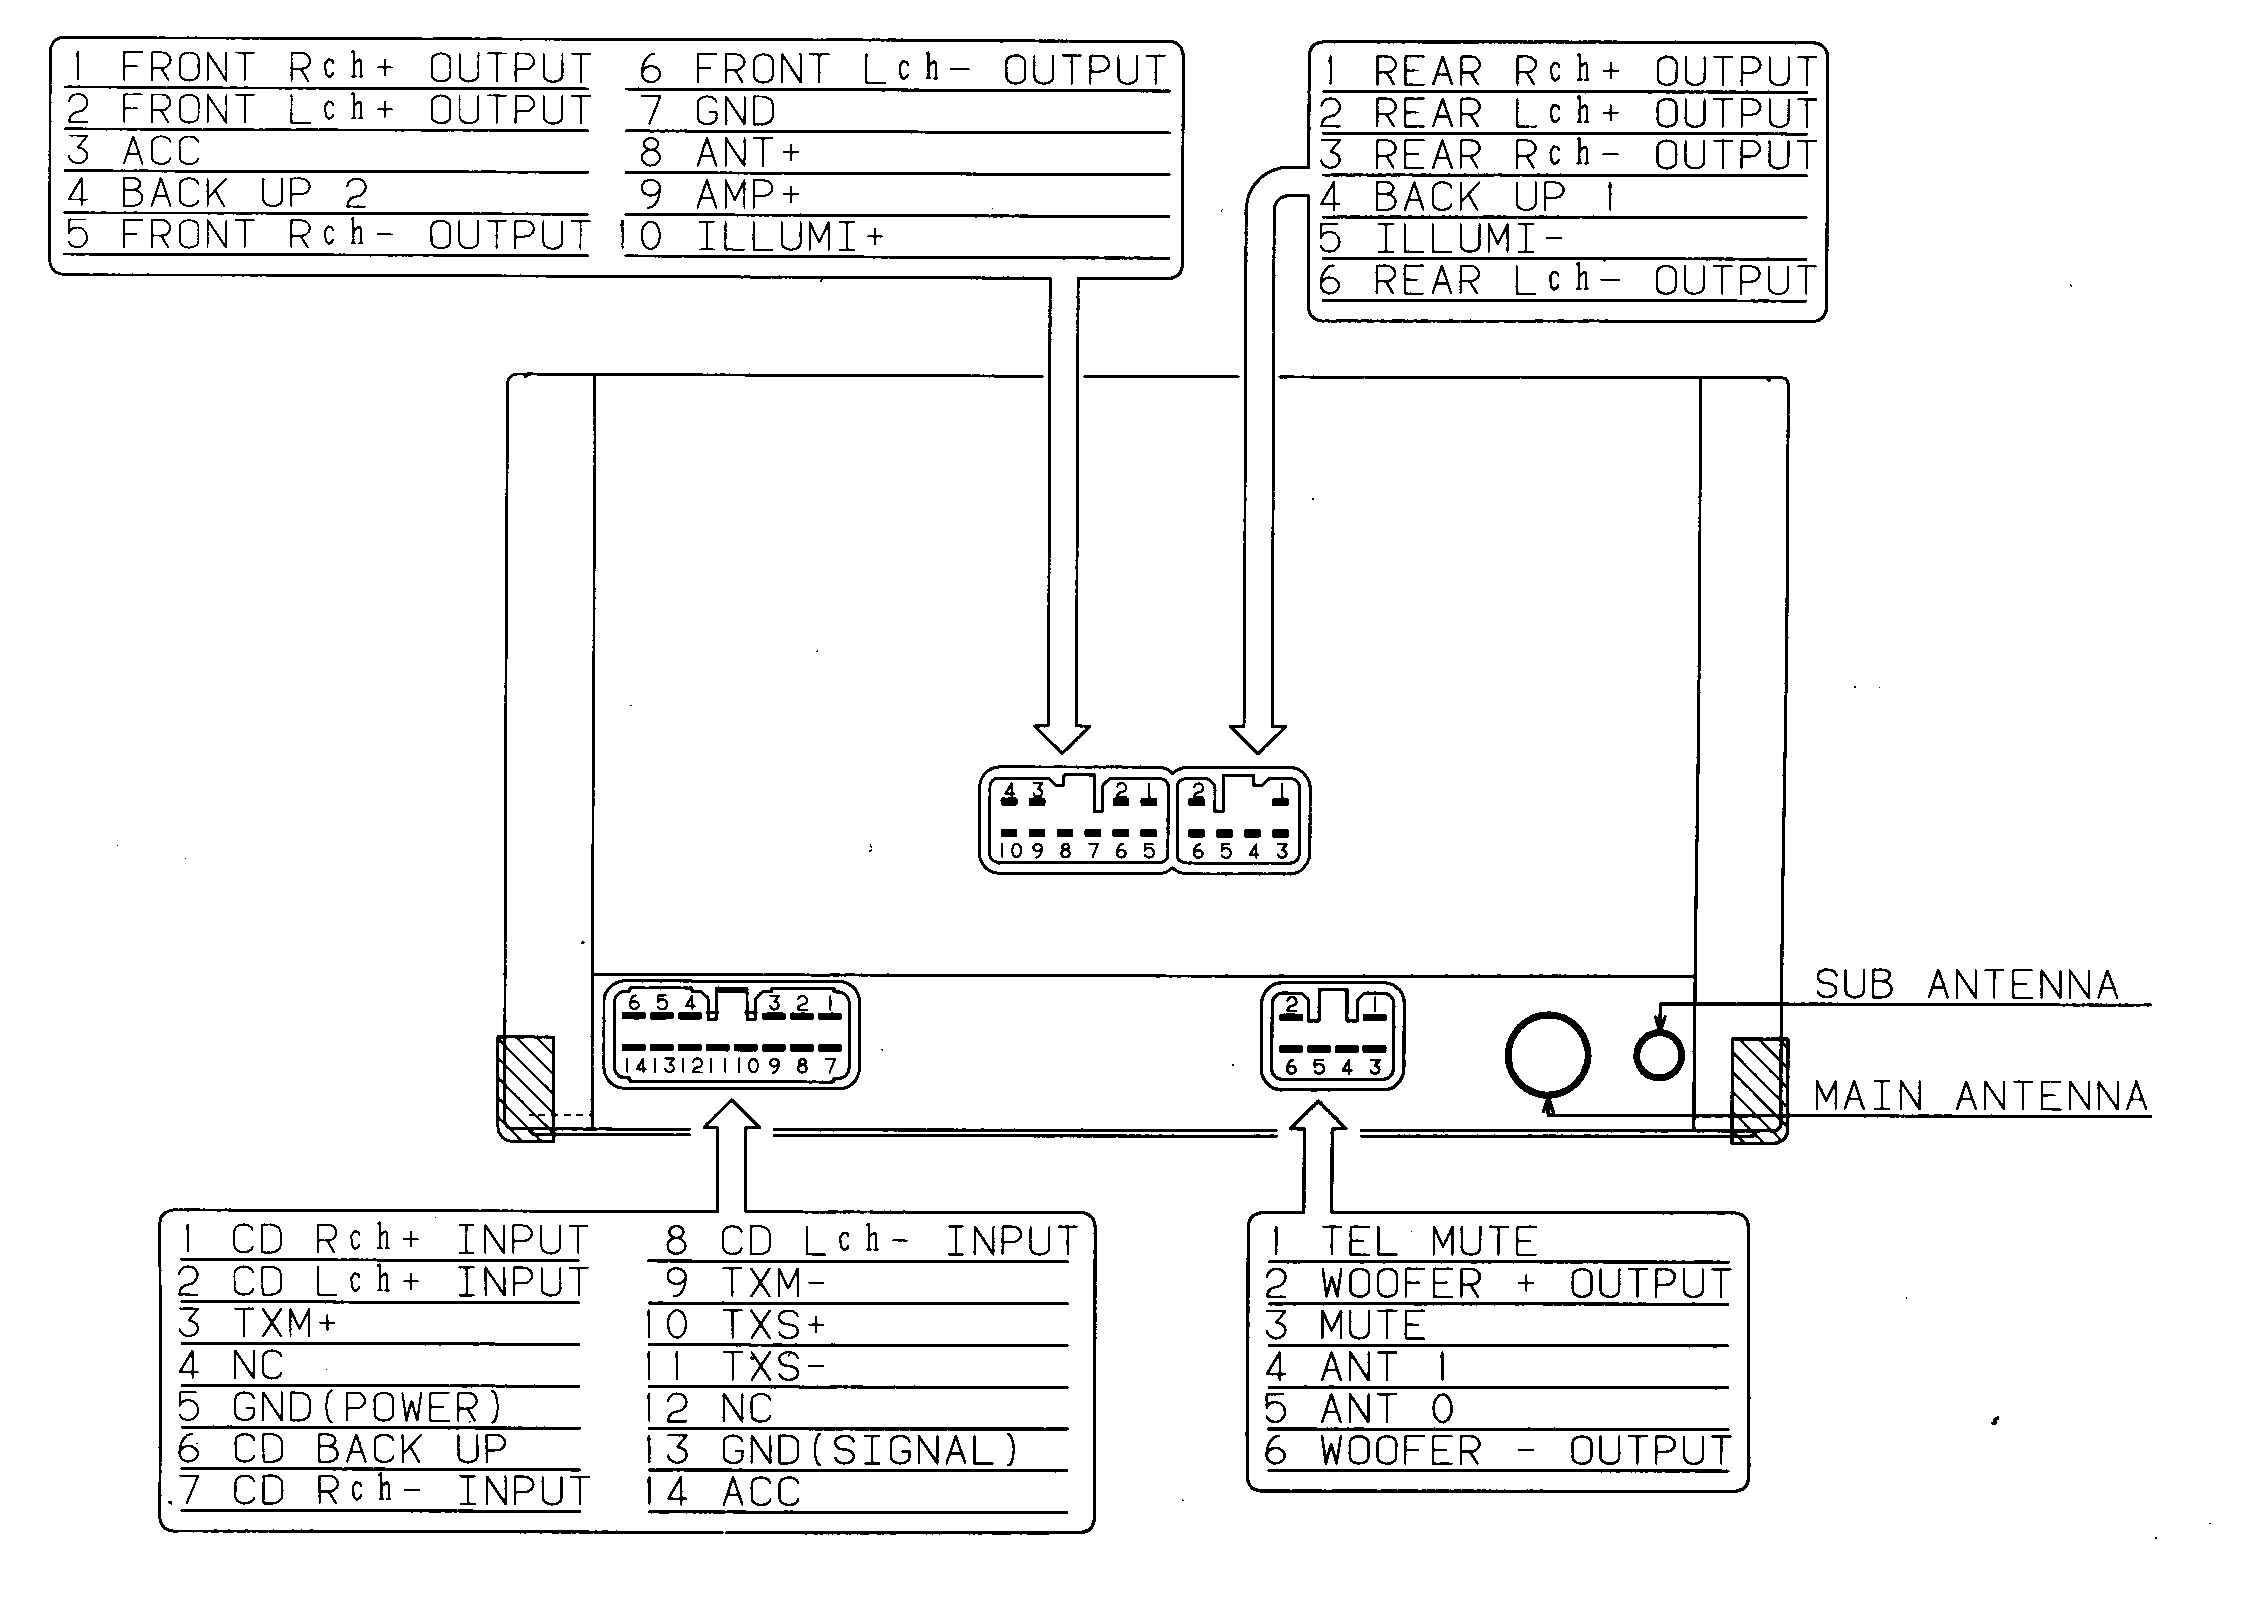 Car Stereo Wiring Harness Diagram sony Xplod Radio Wiring Diagram